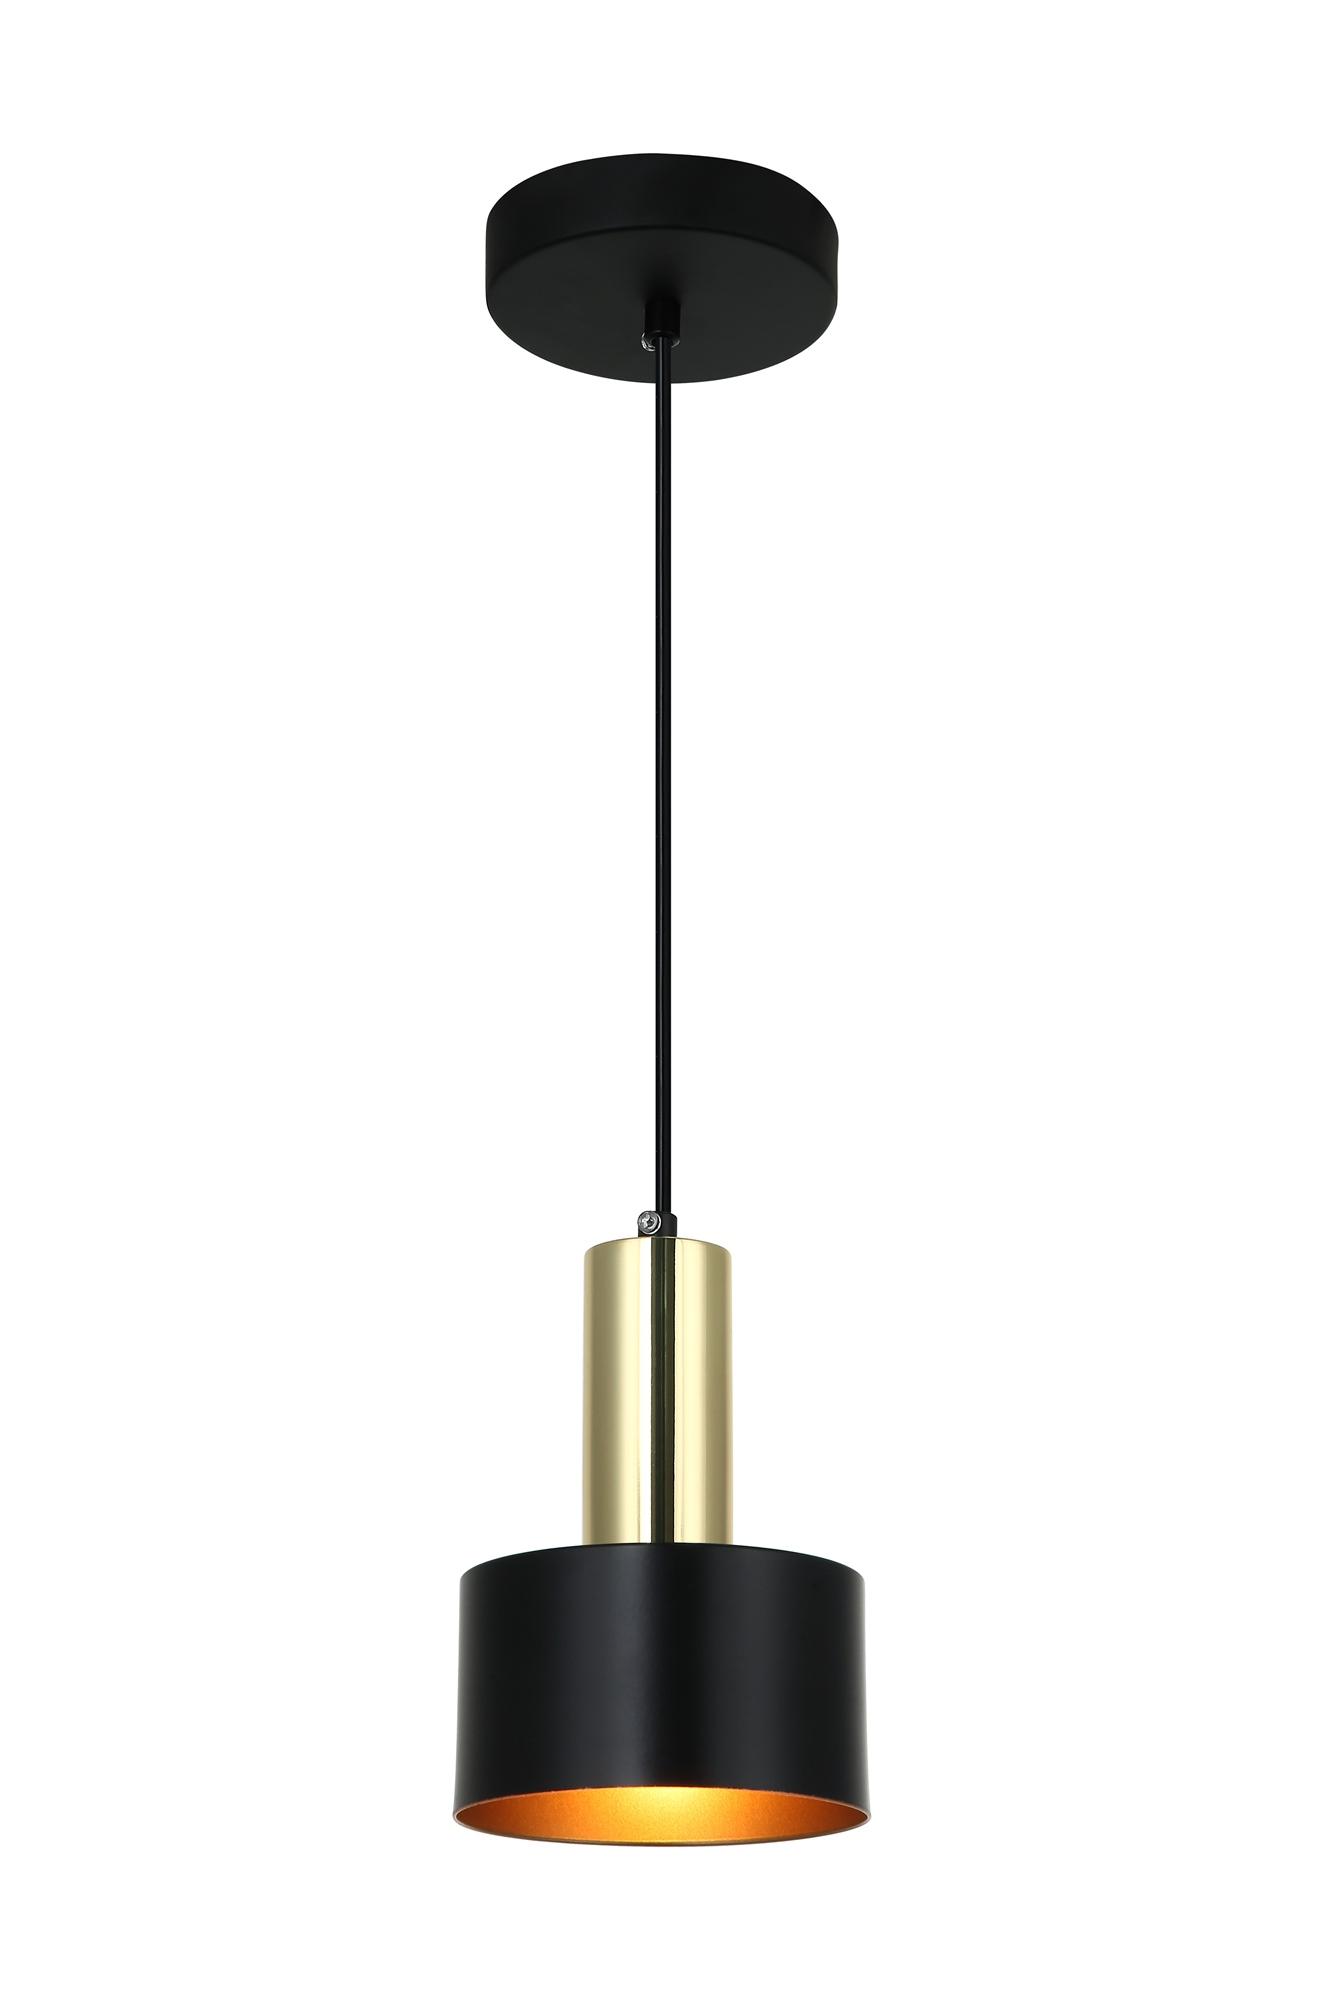 Lampenlux Pendellampe Dalia Hängeleuchte 40W E27 Schwarz / Gold